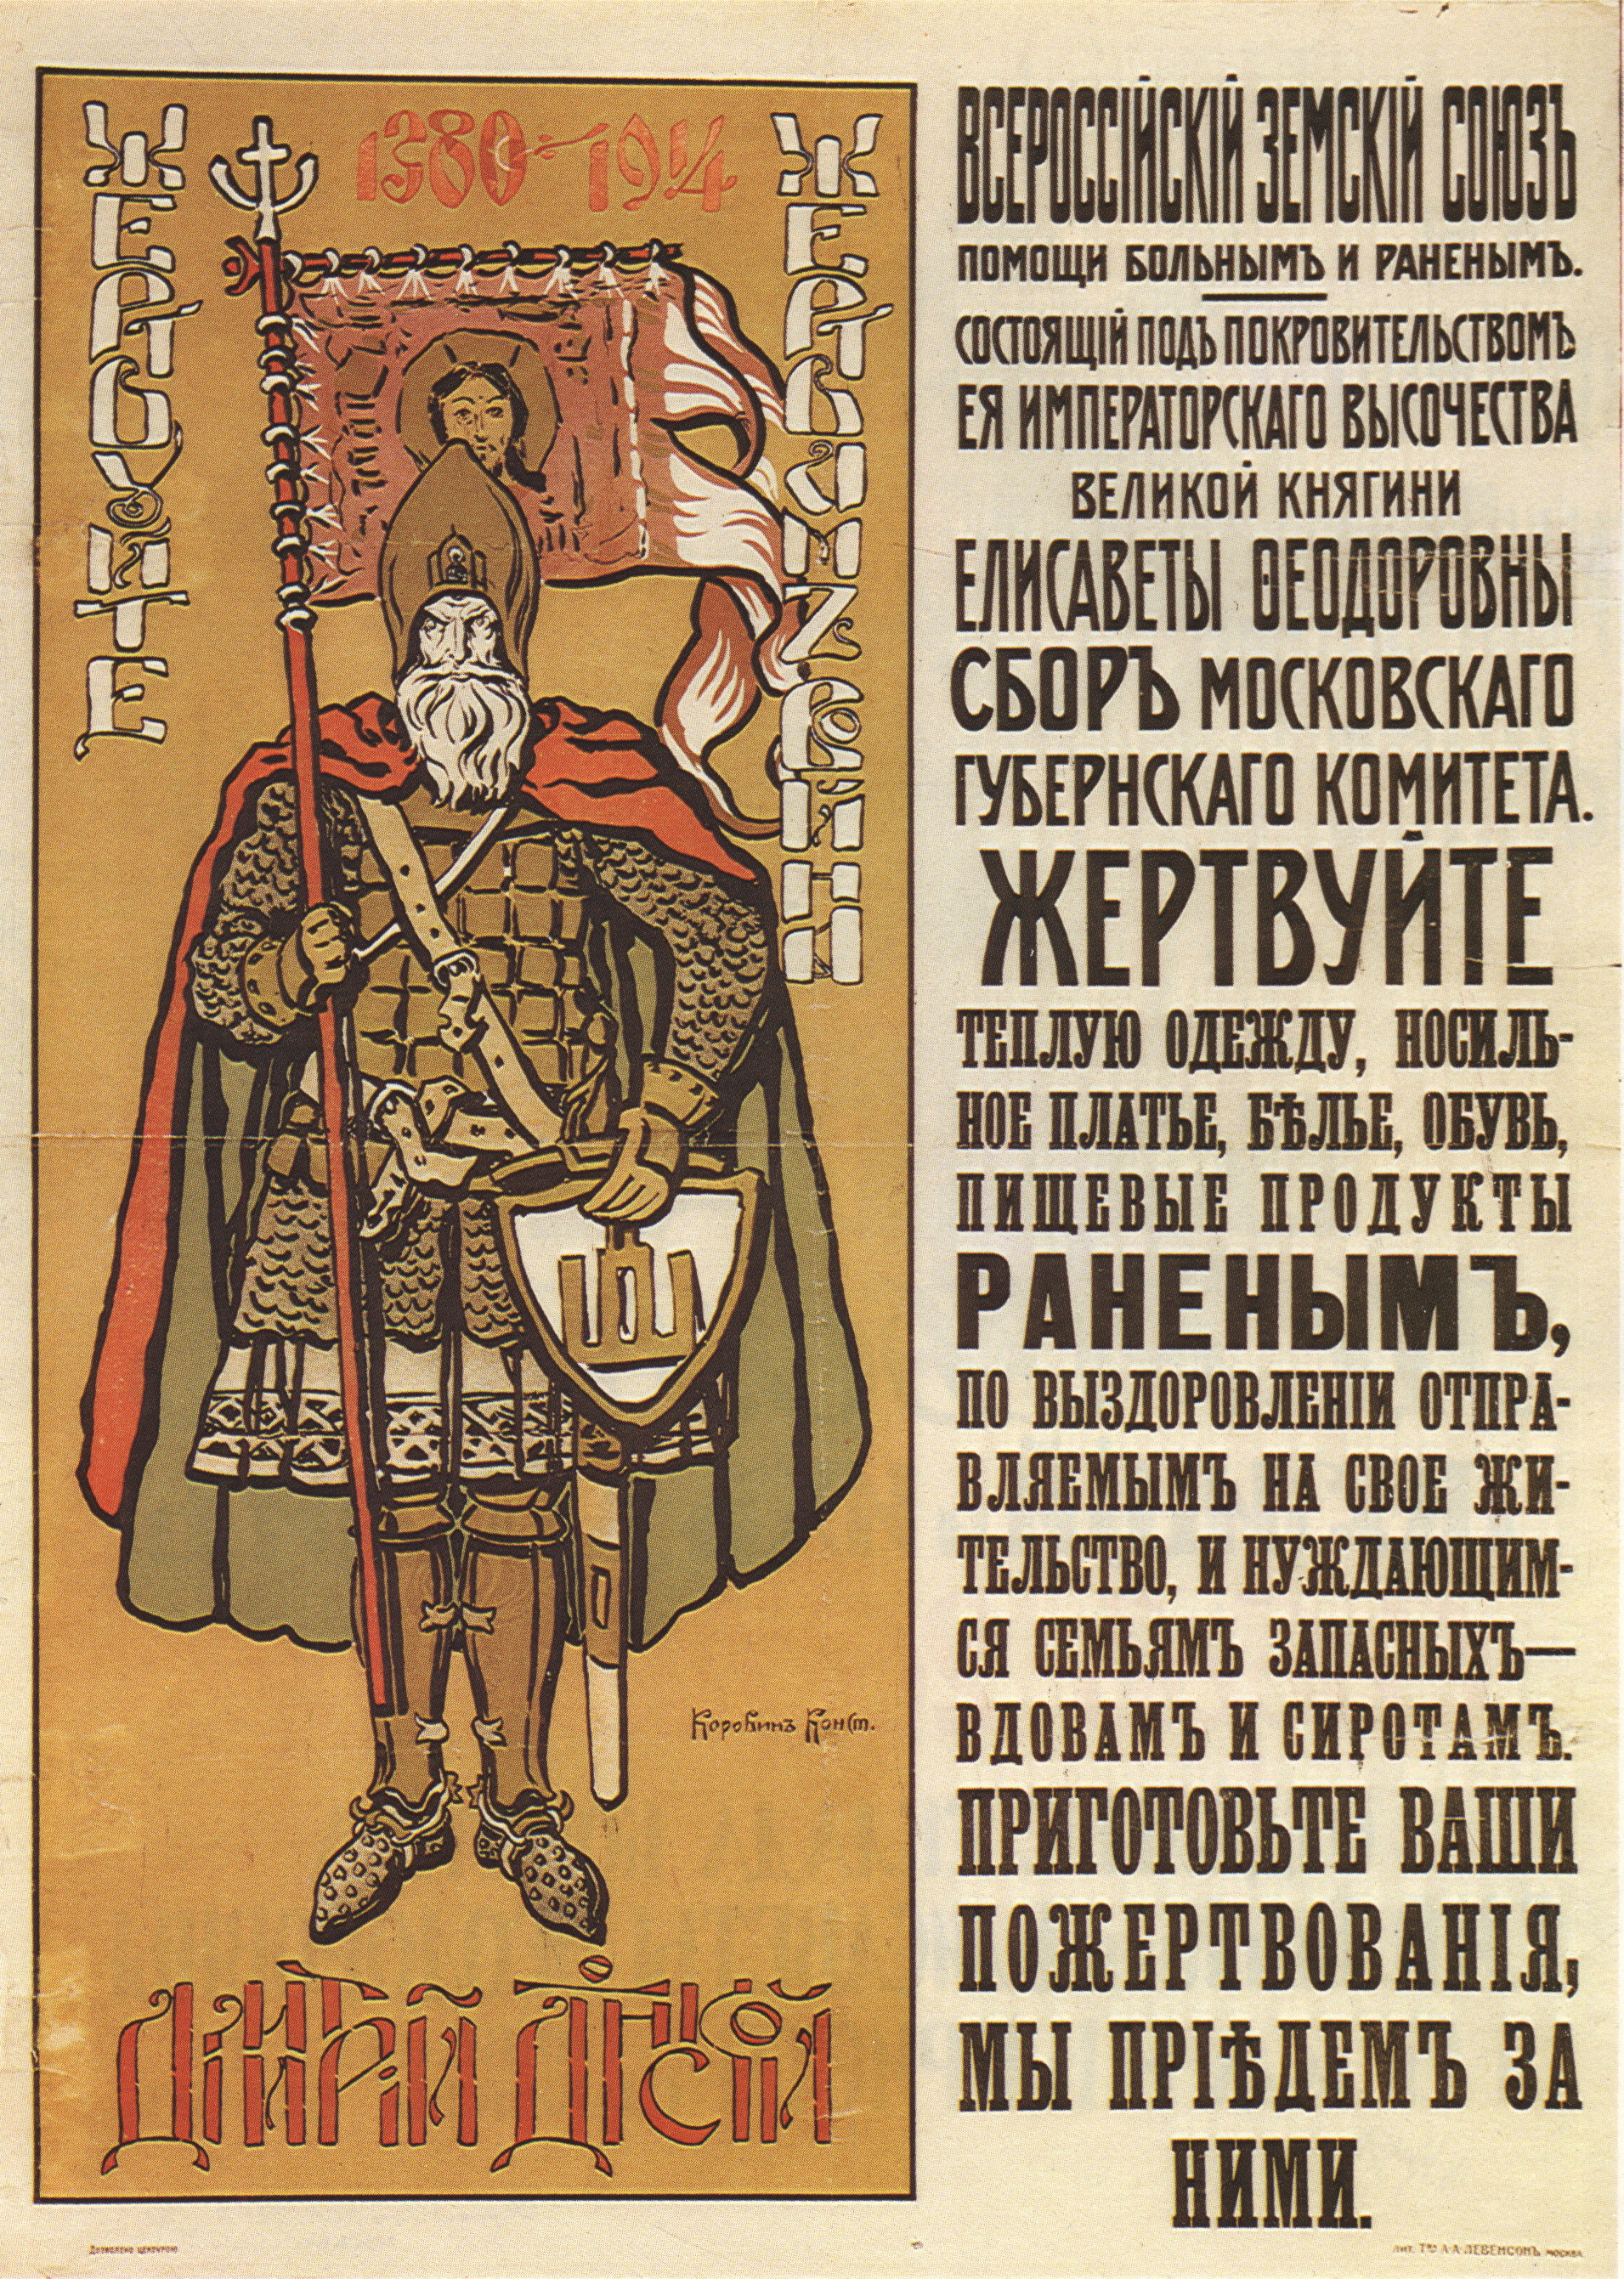 http://upload.wikimedia.org/wikipedia/commons/3/3d/Russian_poster_WWI_011.jpg?uselang=ru